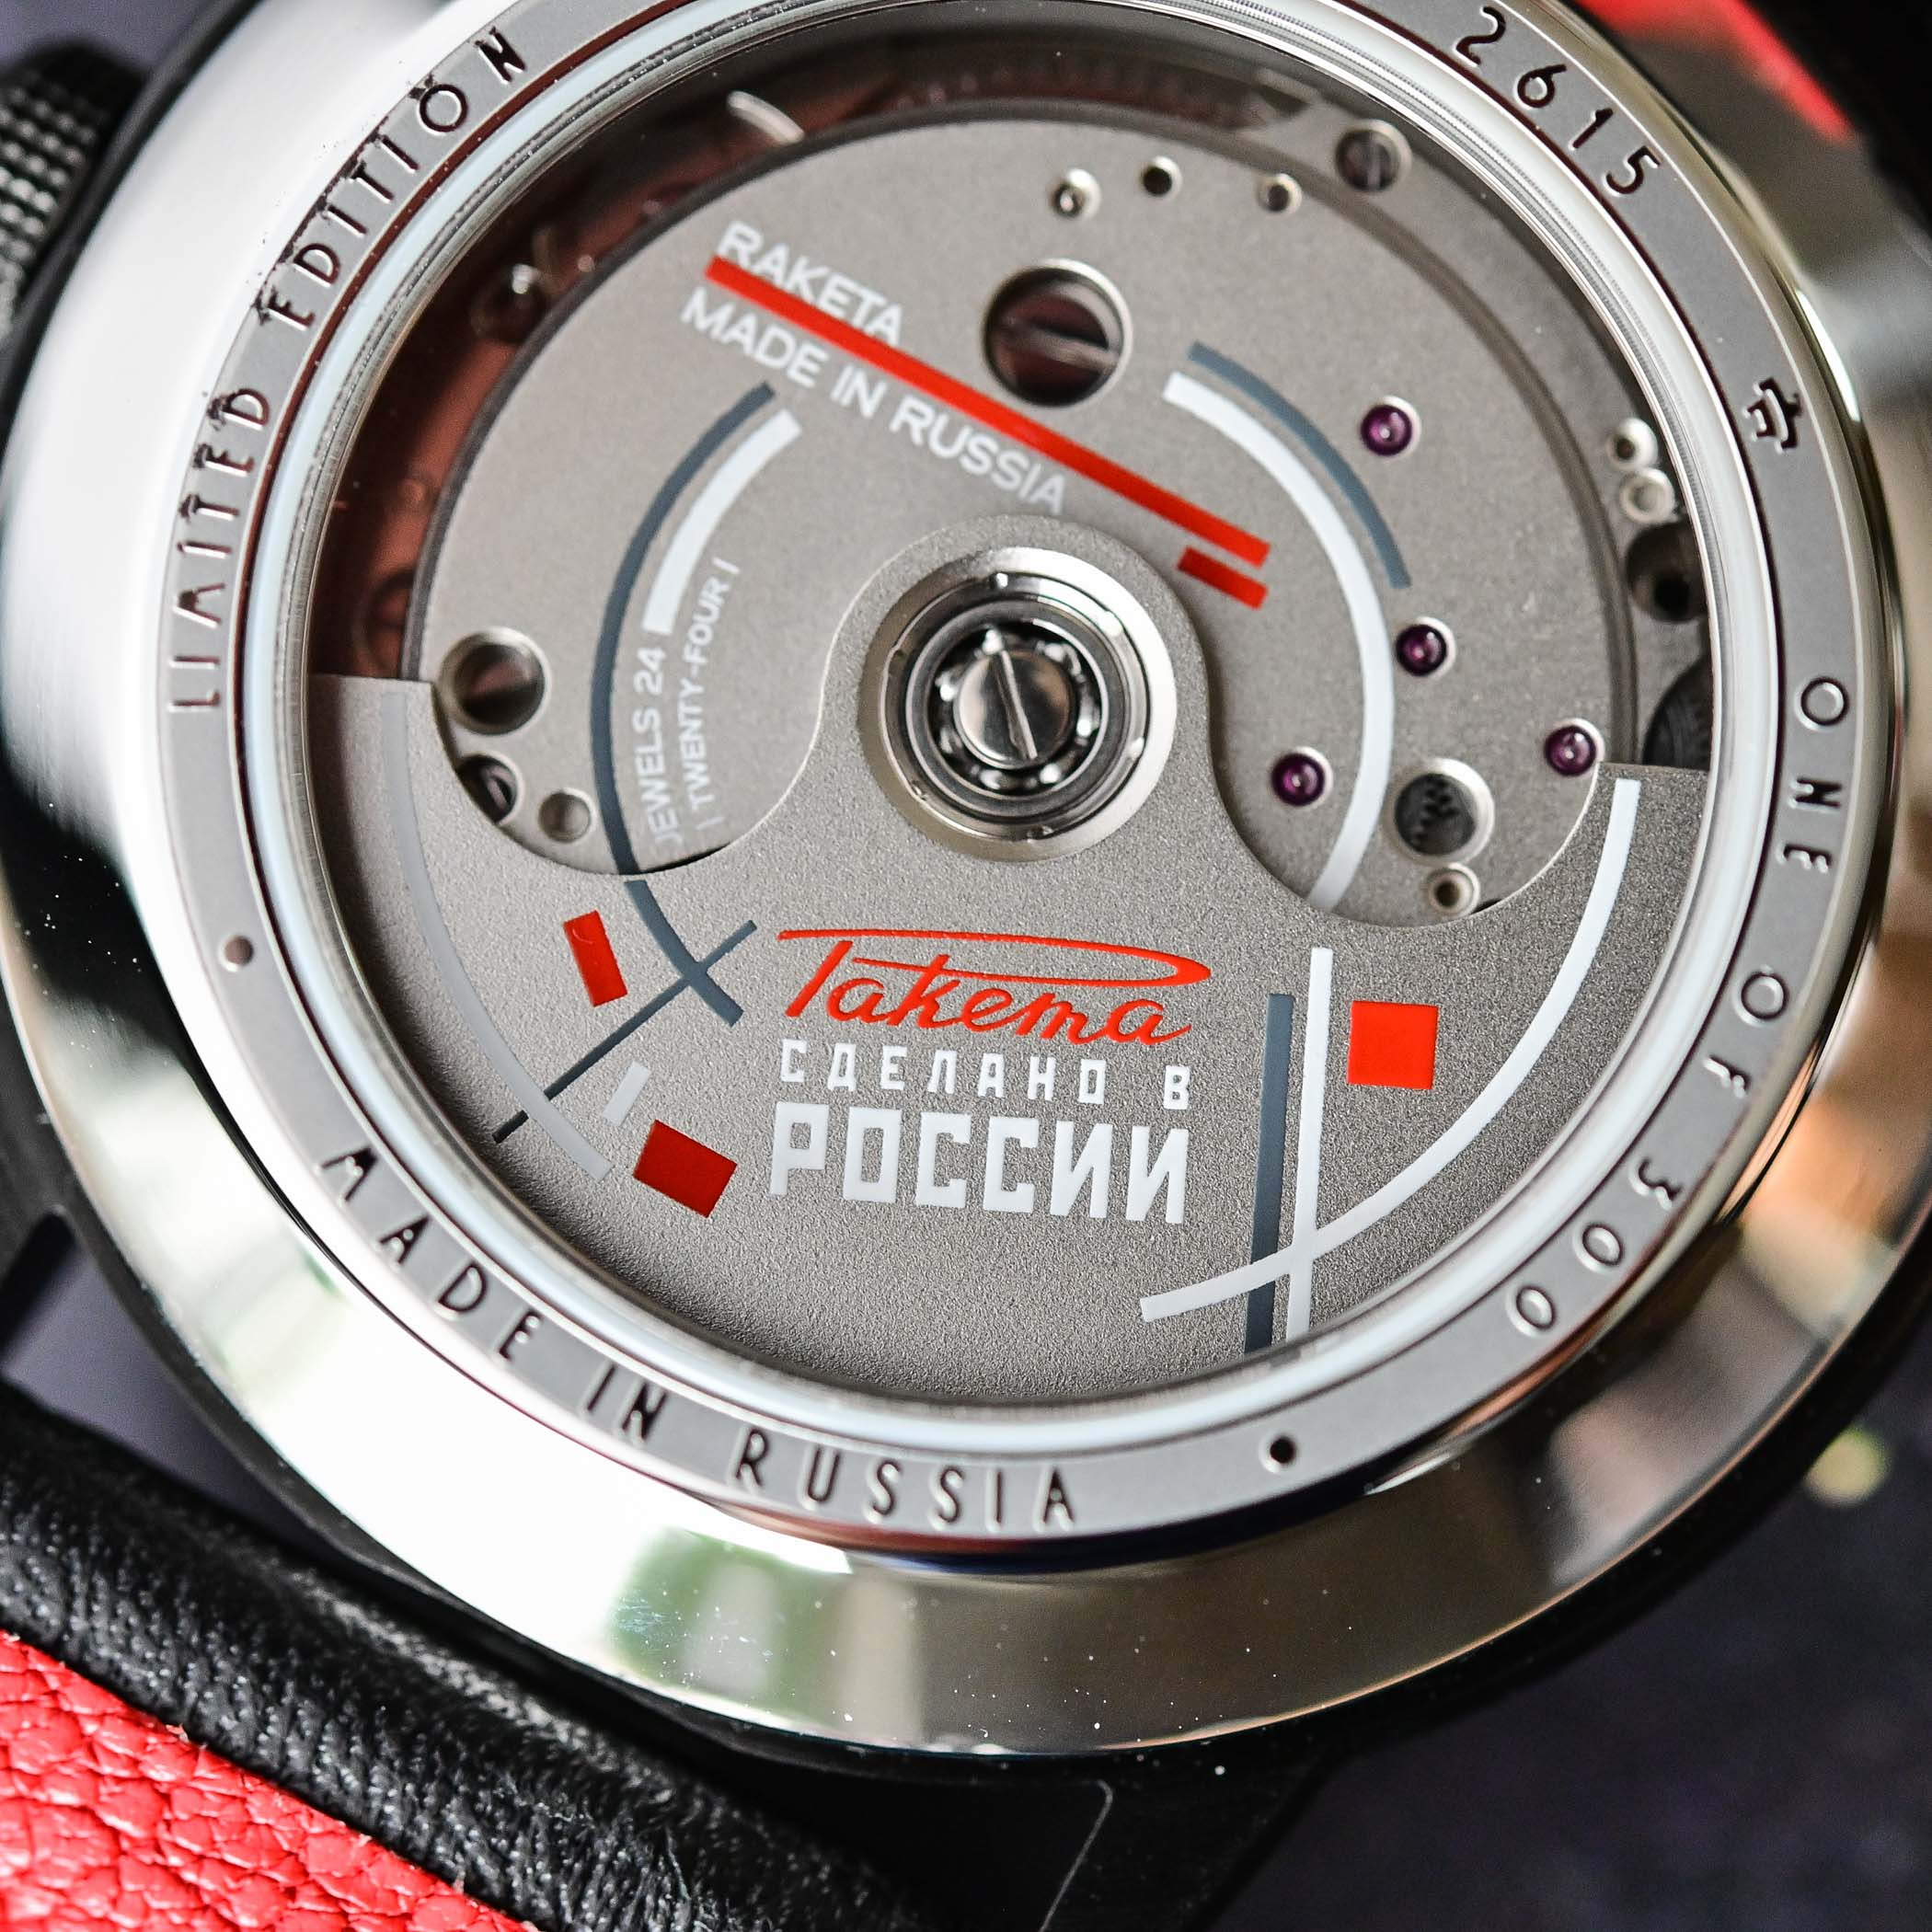 Raketa Avant-Garde Limited Edition 0279 - Art in Motion - review - 6